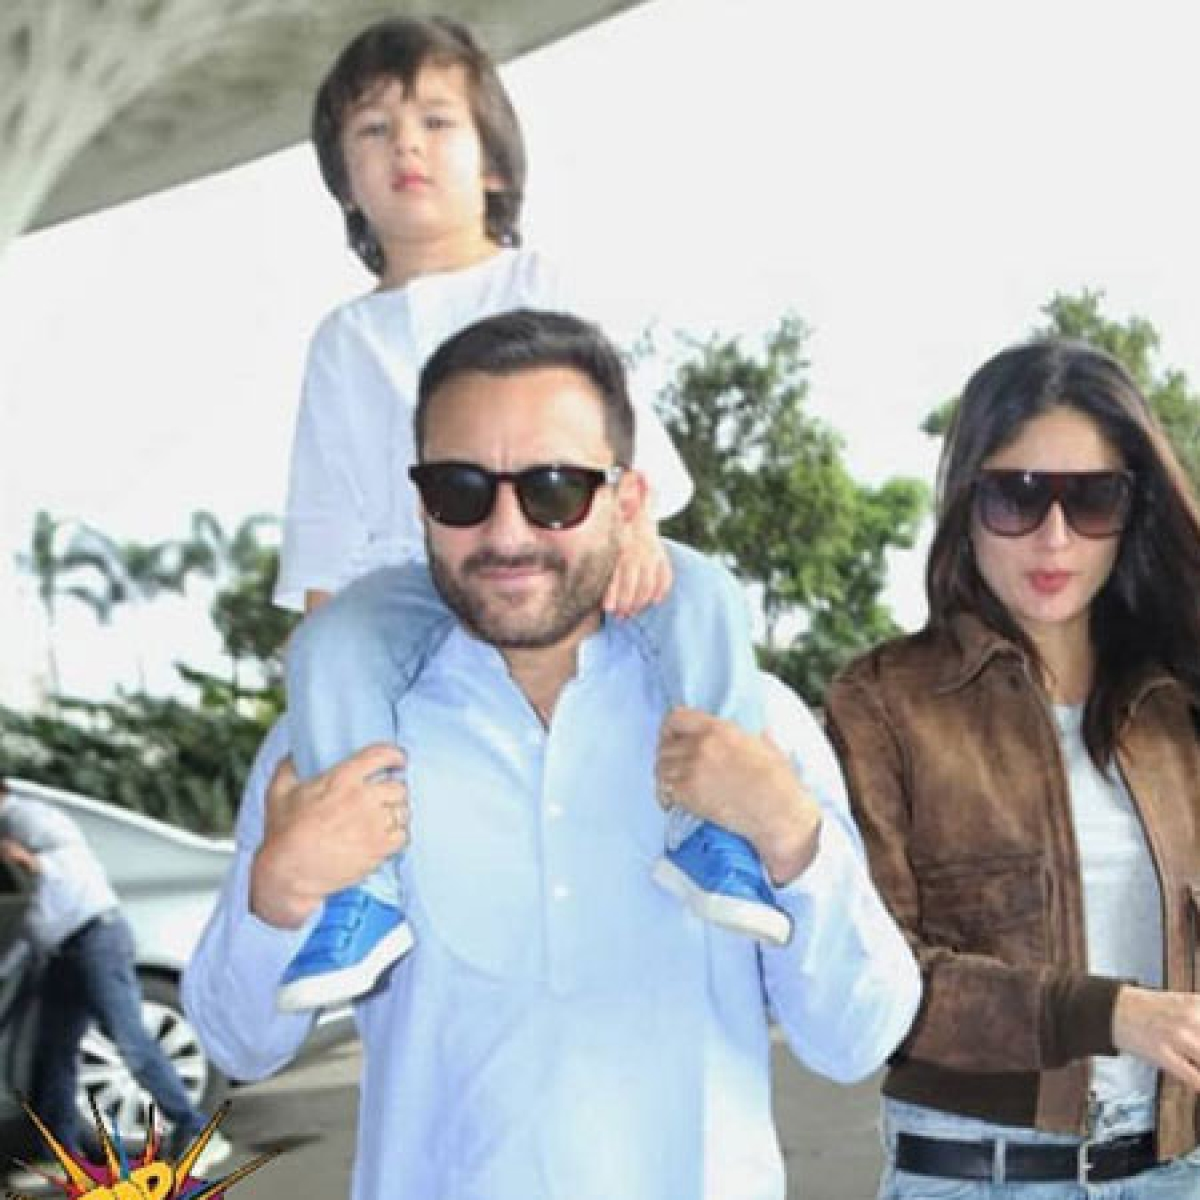 Saif Ali Khan, Kareena Kapoor Khan  lose their way to Pataudi Palace, get mobbed for selfies